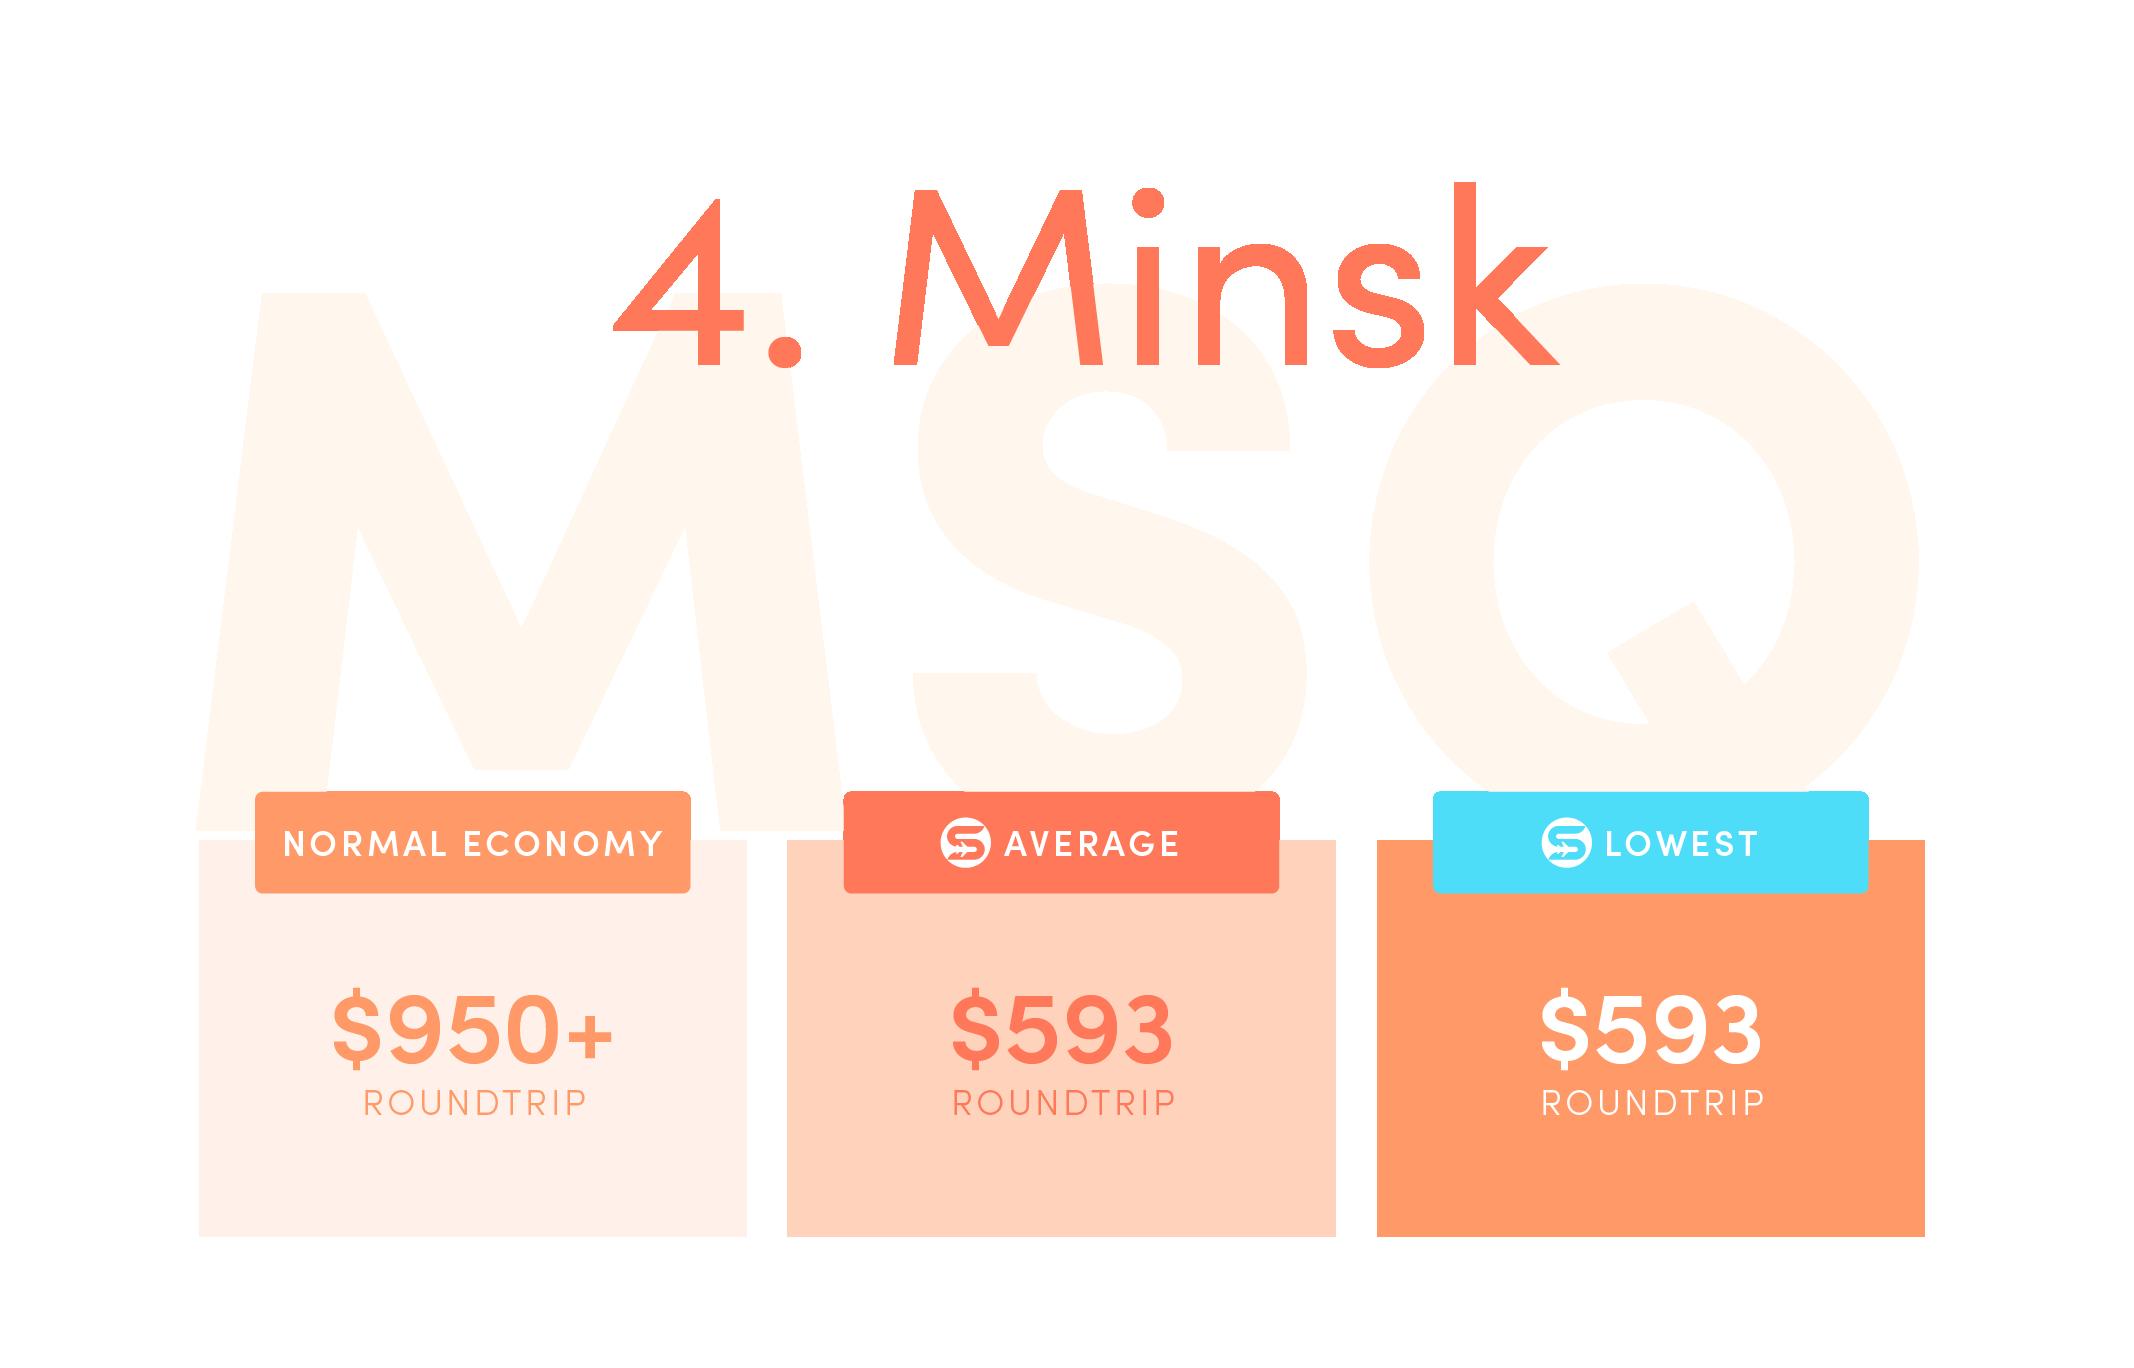 Minsk (MSQ). Normal economy price from the US: $950+ roundtrip. Average Scott's Cheap Flights economy price: $593 roundtrip. Lowest Scott's Cheap Flights price in 2021: $593 roundtrip.